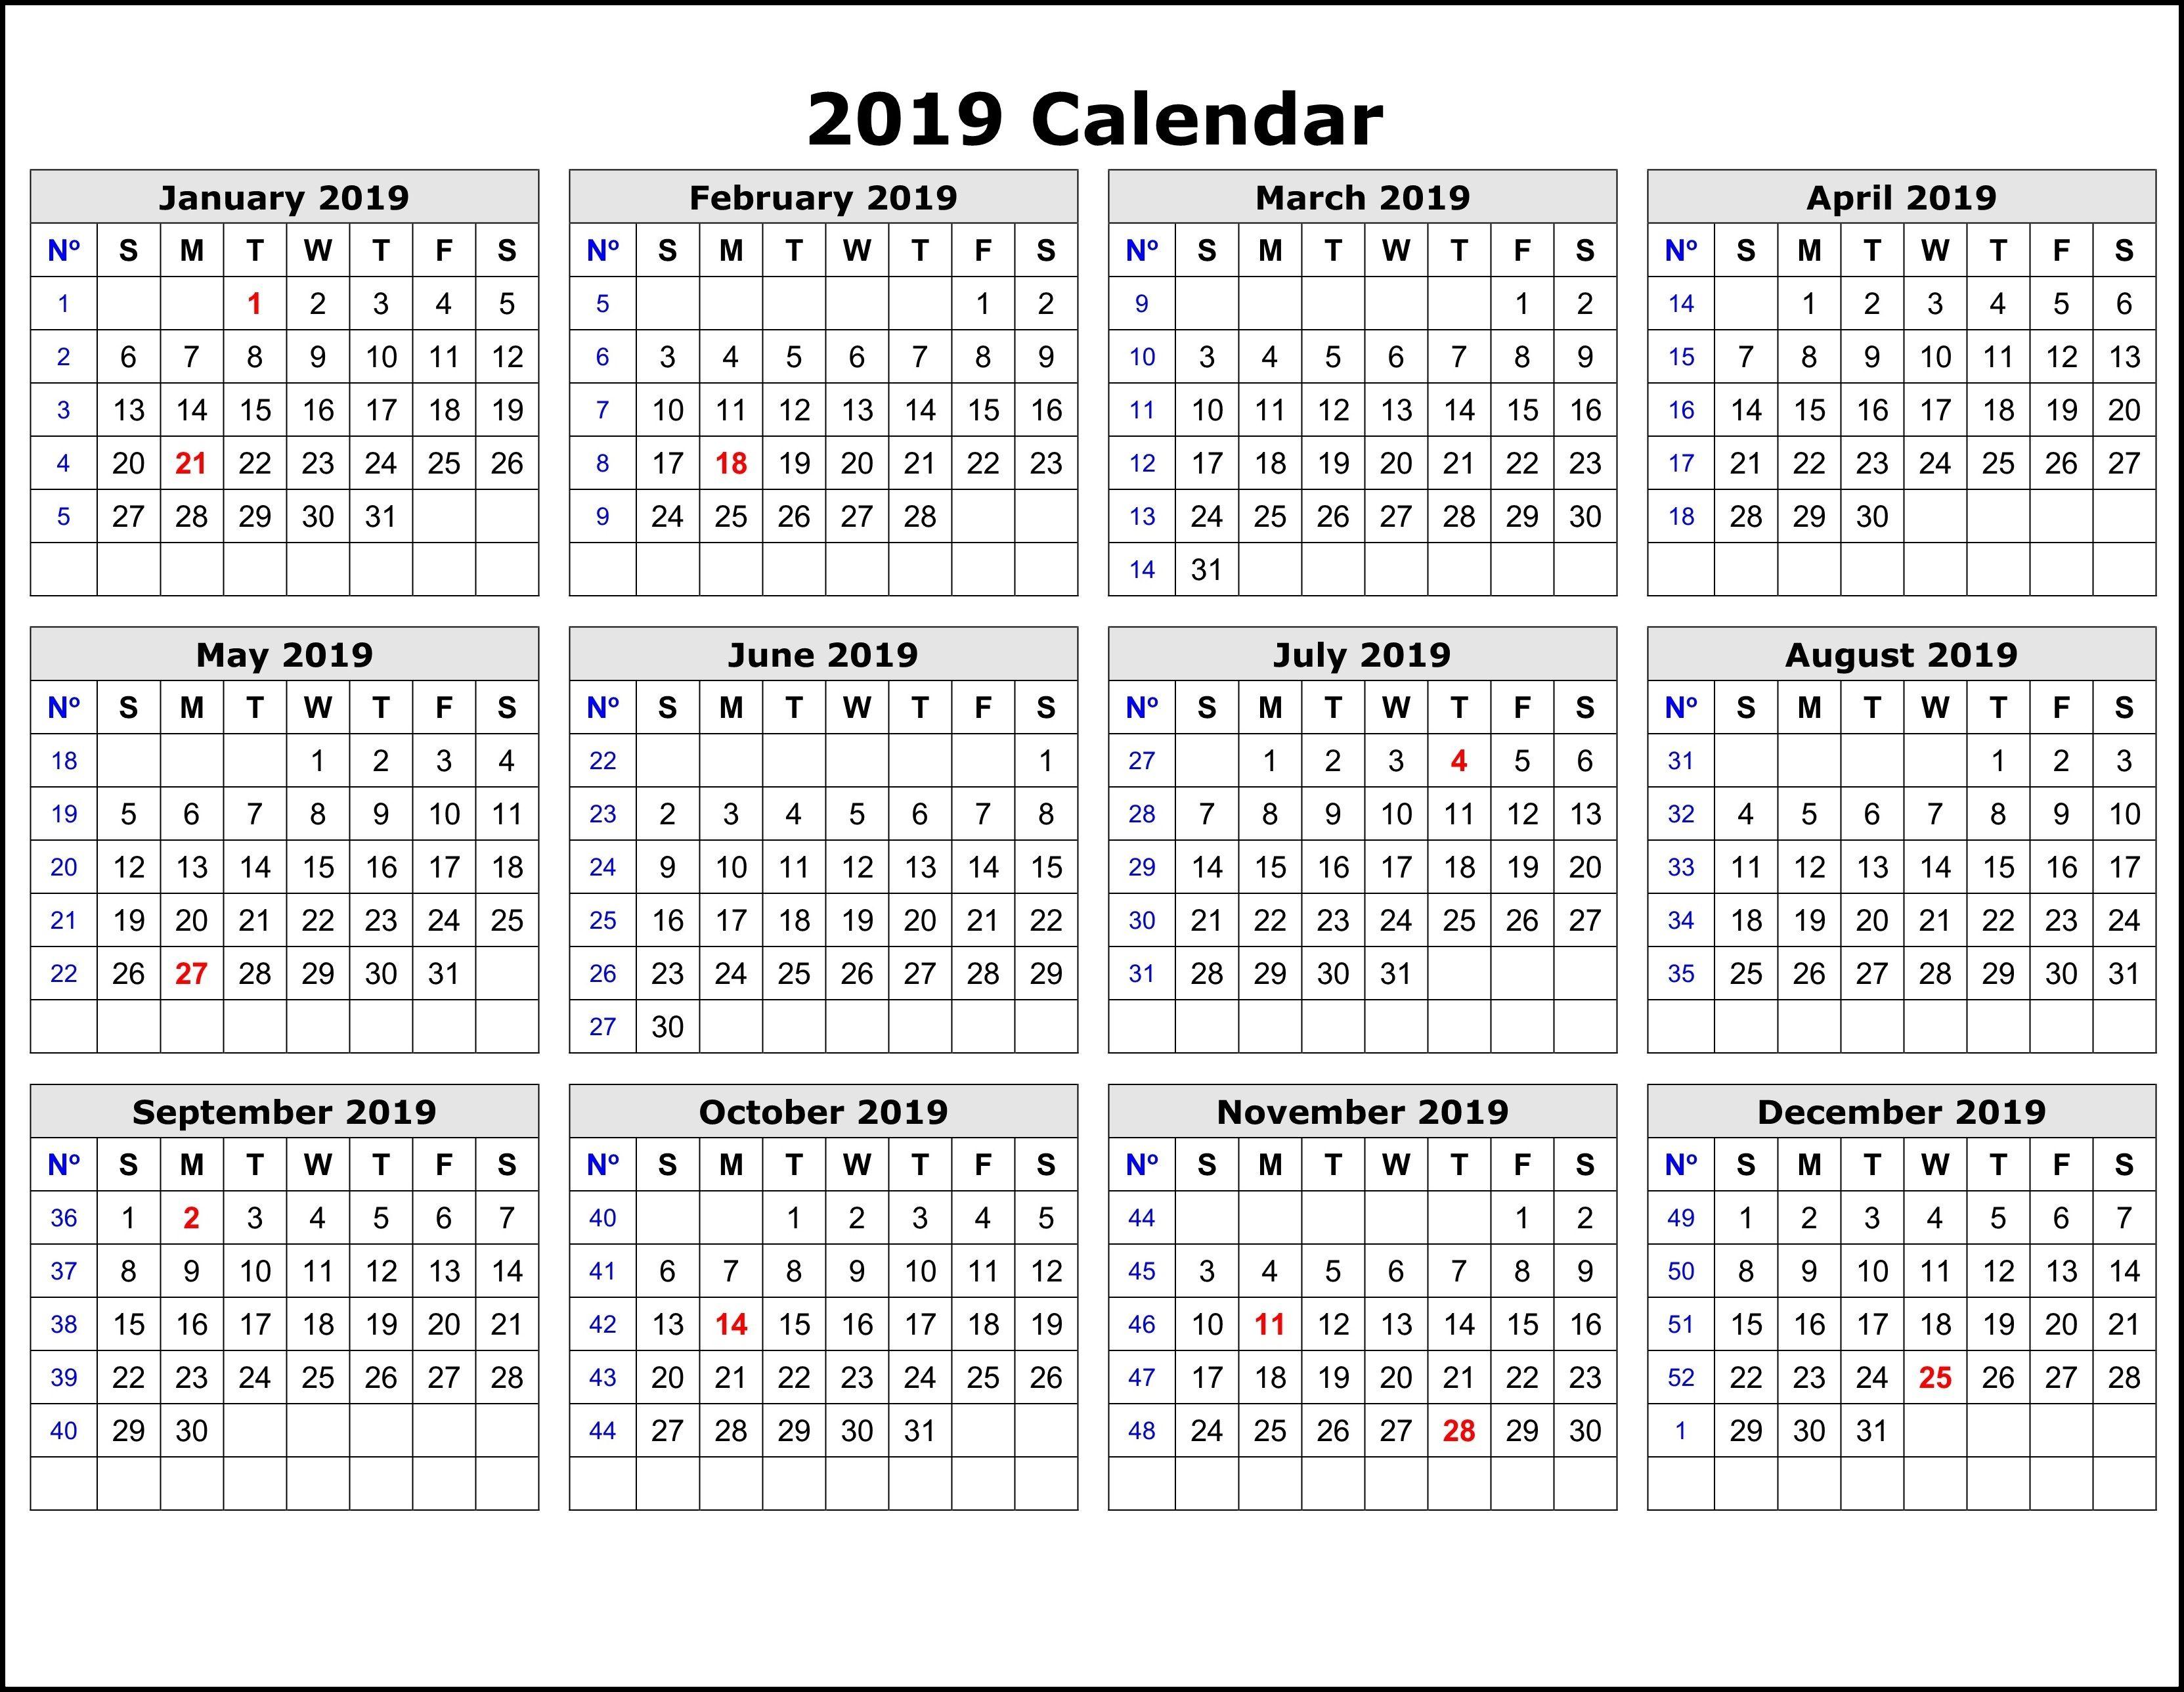 2019 Calendar Printable 12 Month Calendar On One Page Printable